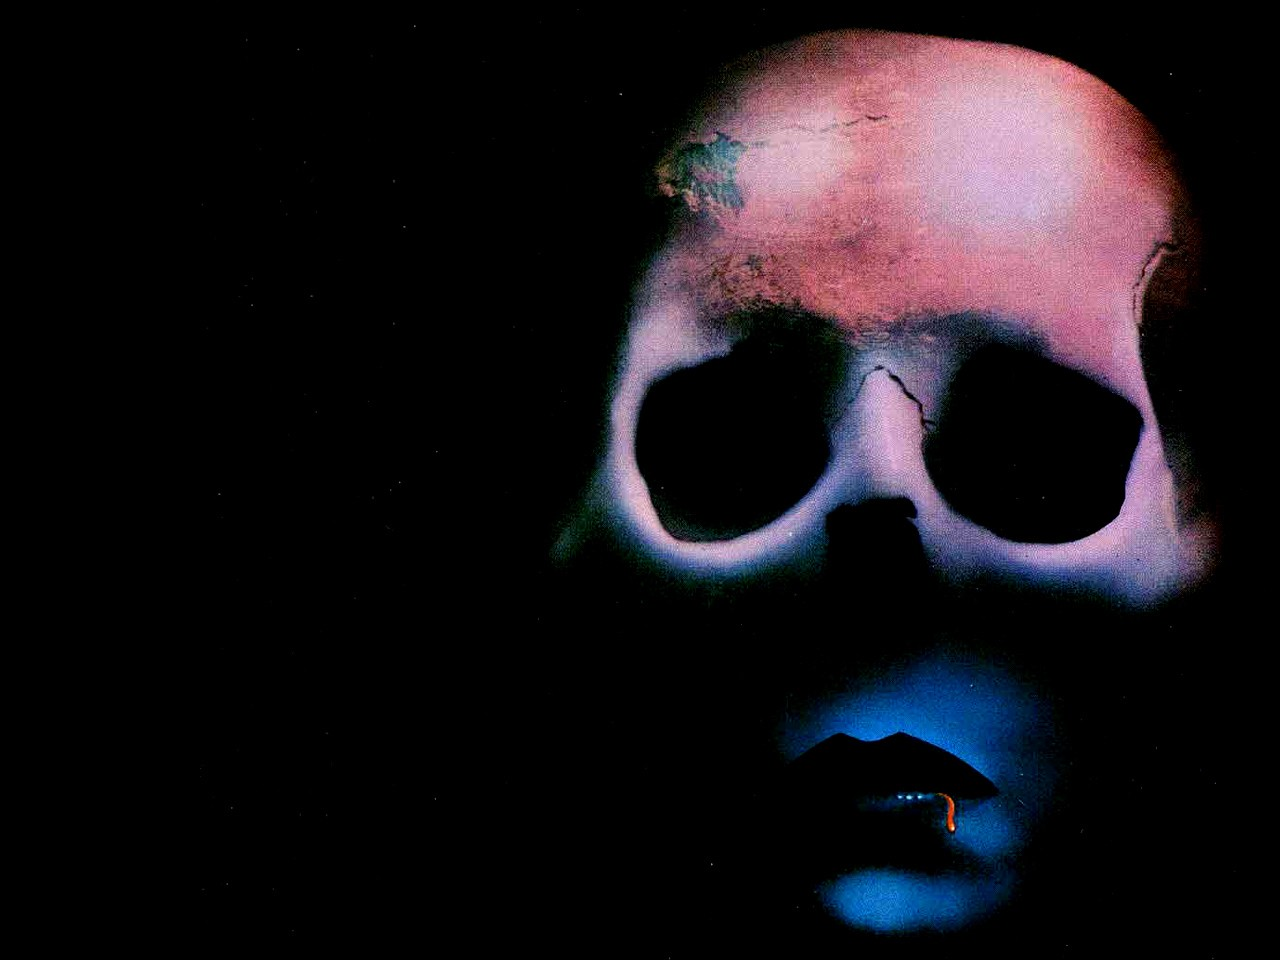 http://2.bp.blogspot.com/-qfVvOvbQ7bM/T0UNcZpPDtI/AAAAAAAAAcw/Hxf1MIKY4Sw/s1600/un-wallpaper-di-inferno-di-dario-argento-128452.jpg